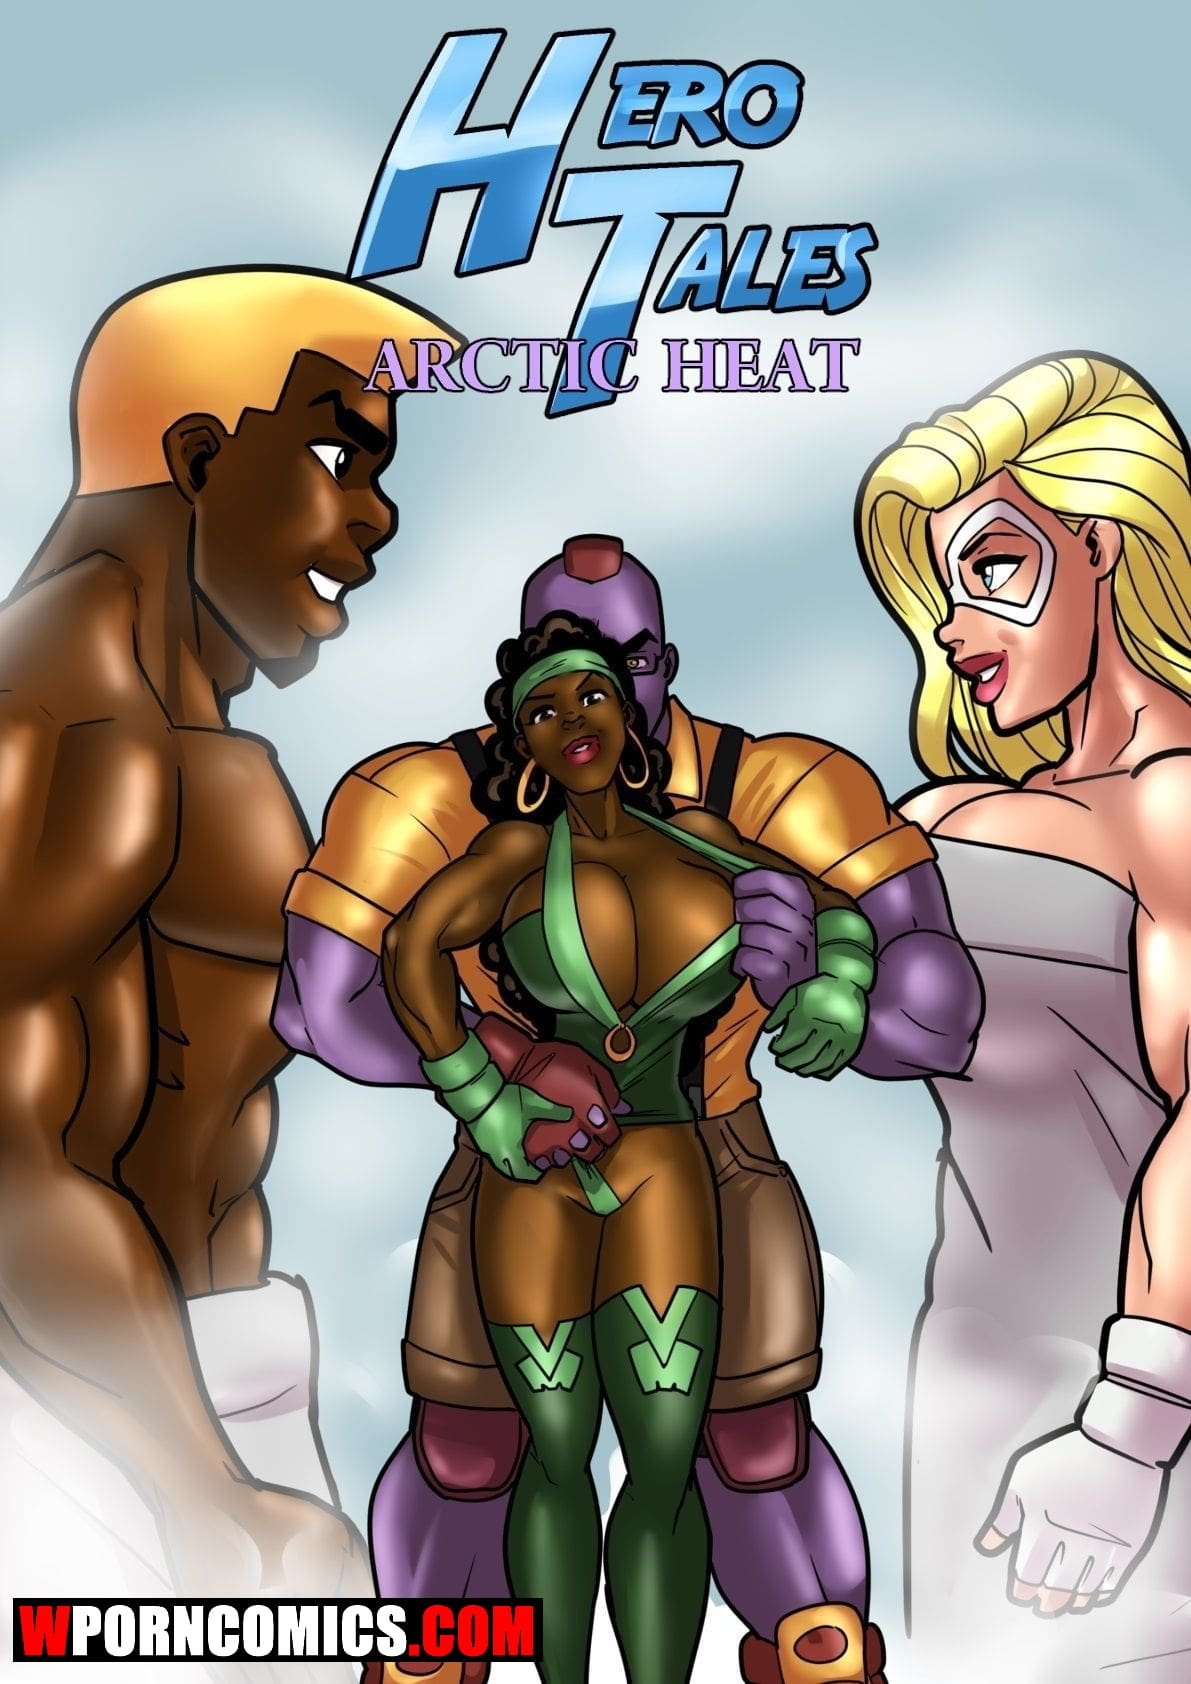 Free Read Sex Comic ✅️ rabies ✅️ | read incest comics for free, adult comics